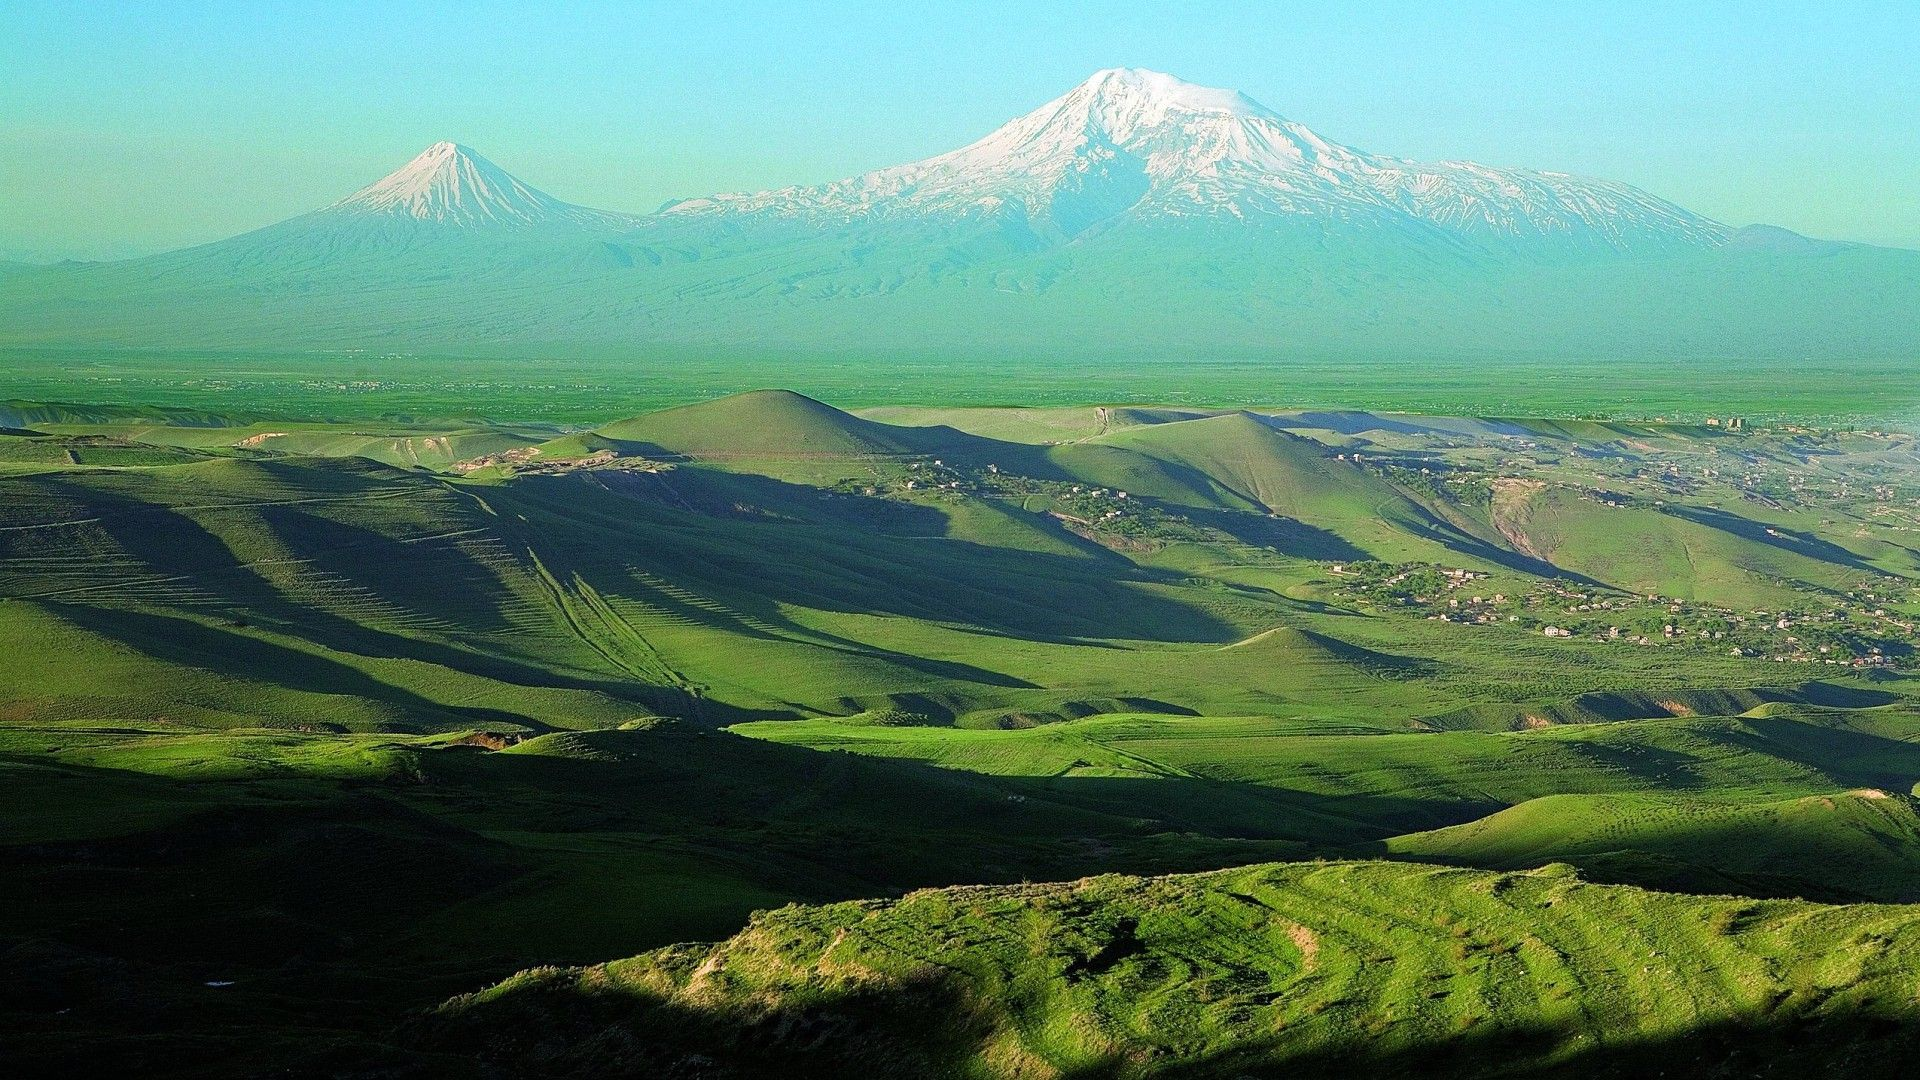 Landscape Nature Hd Backgrounds Desktop Wallpapers Scenery Wallpaper Scenery Mountains